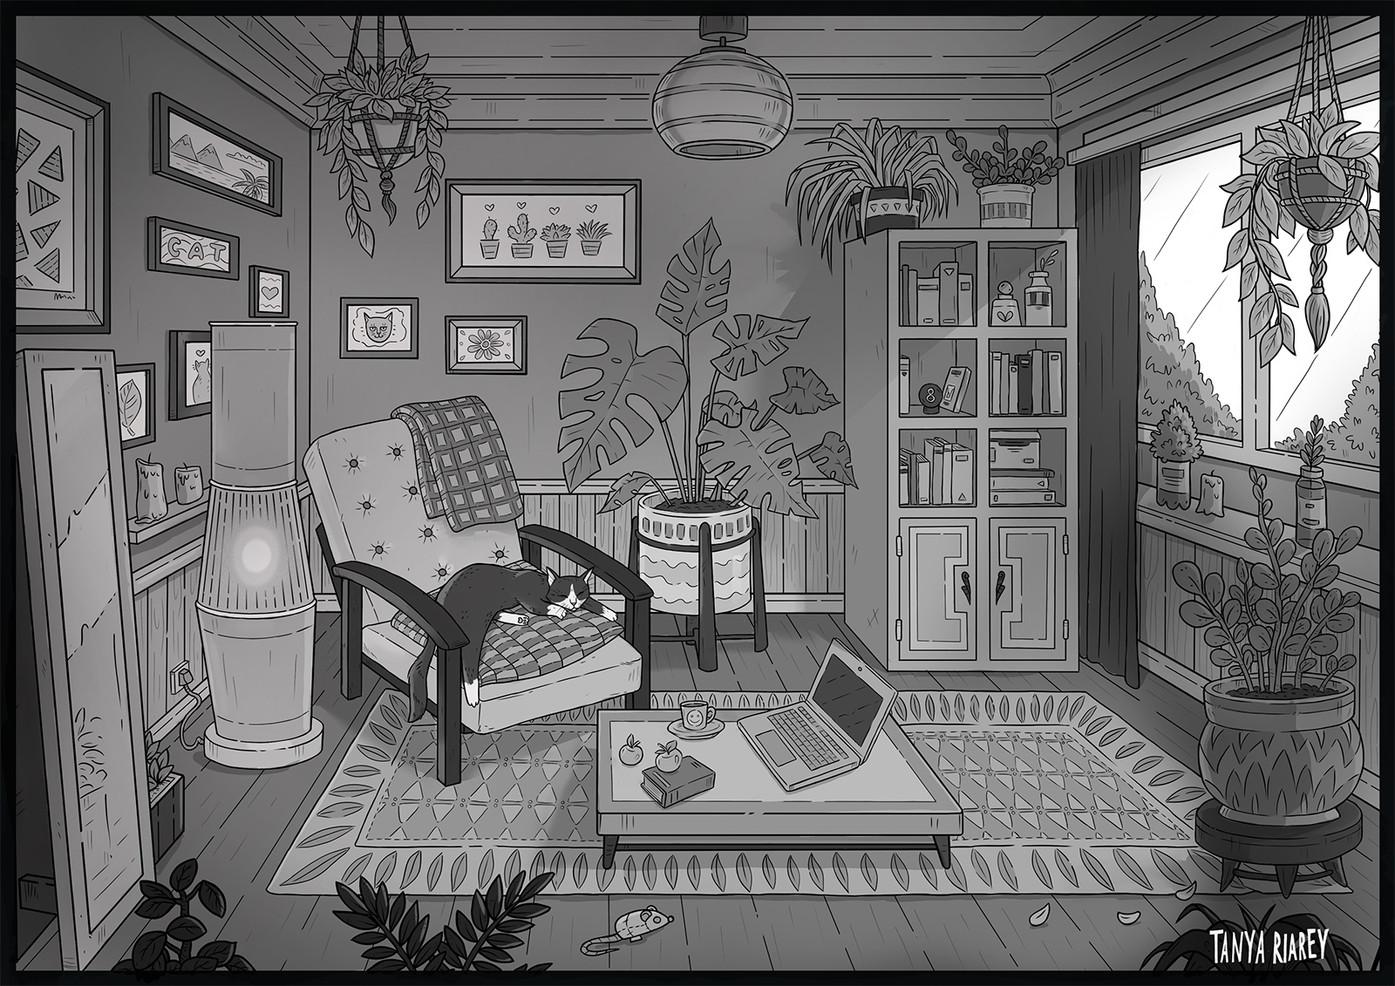 room-with-cat.jpg